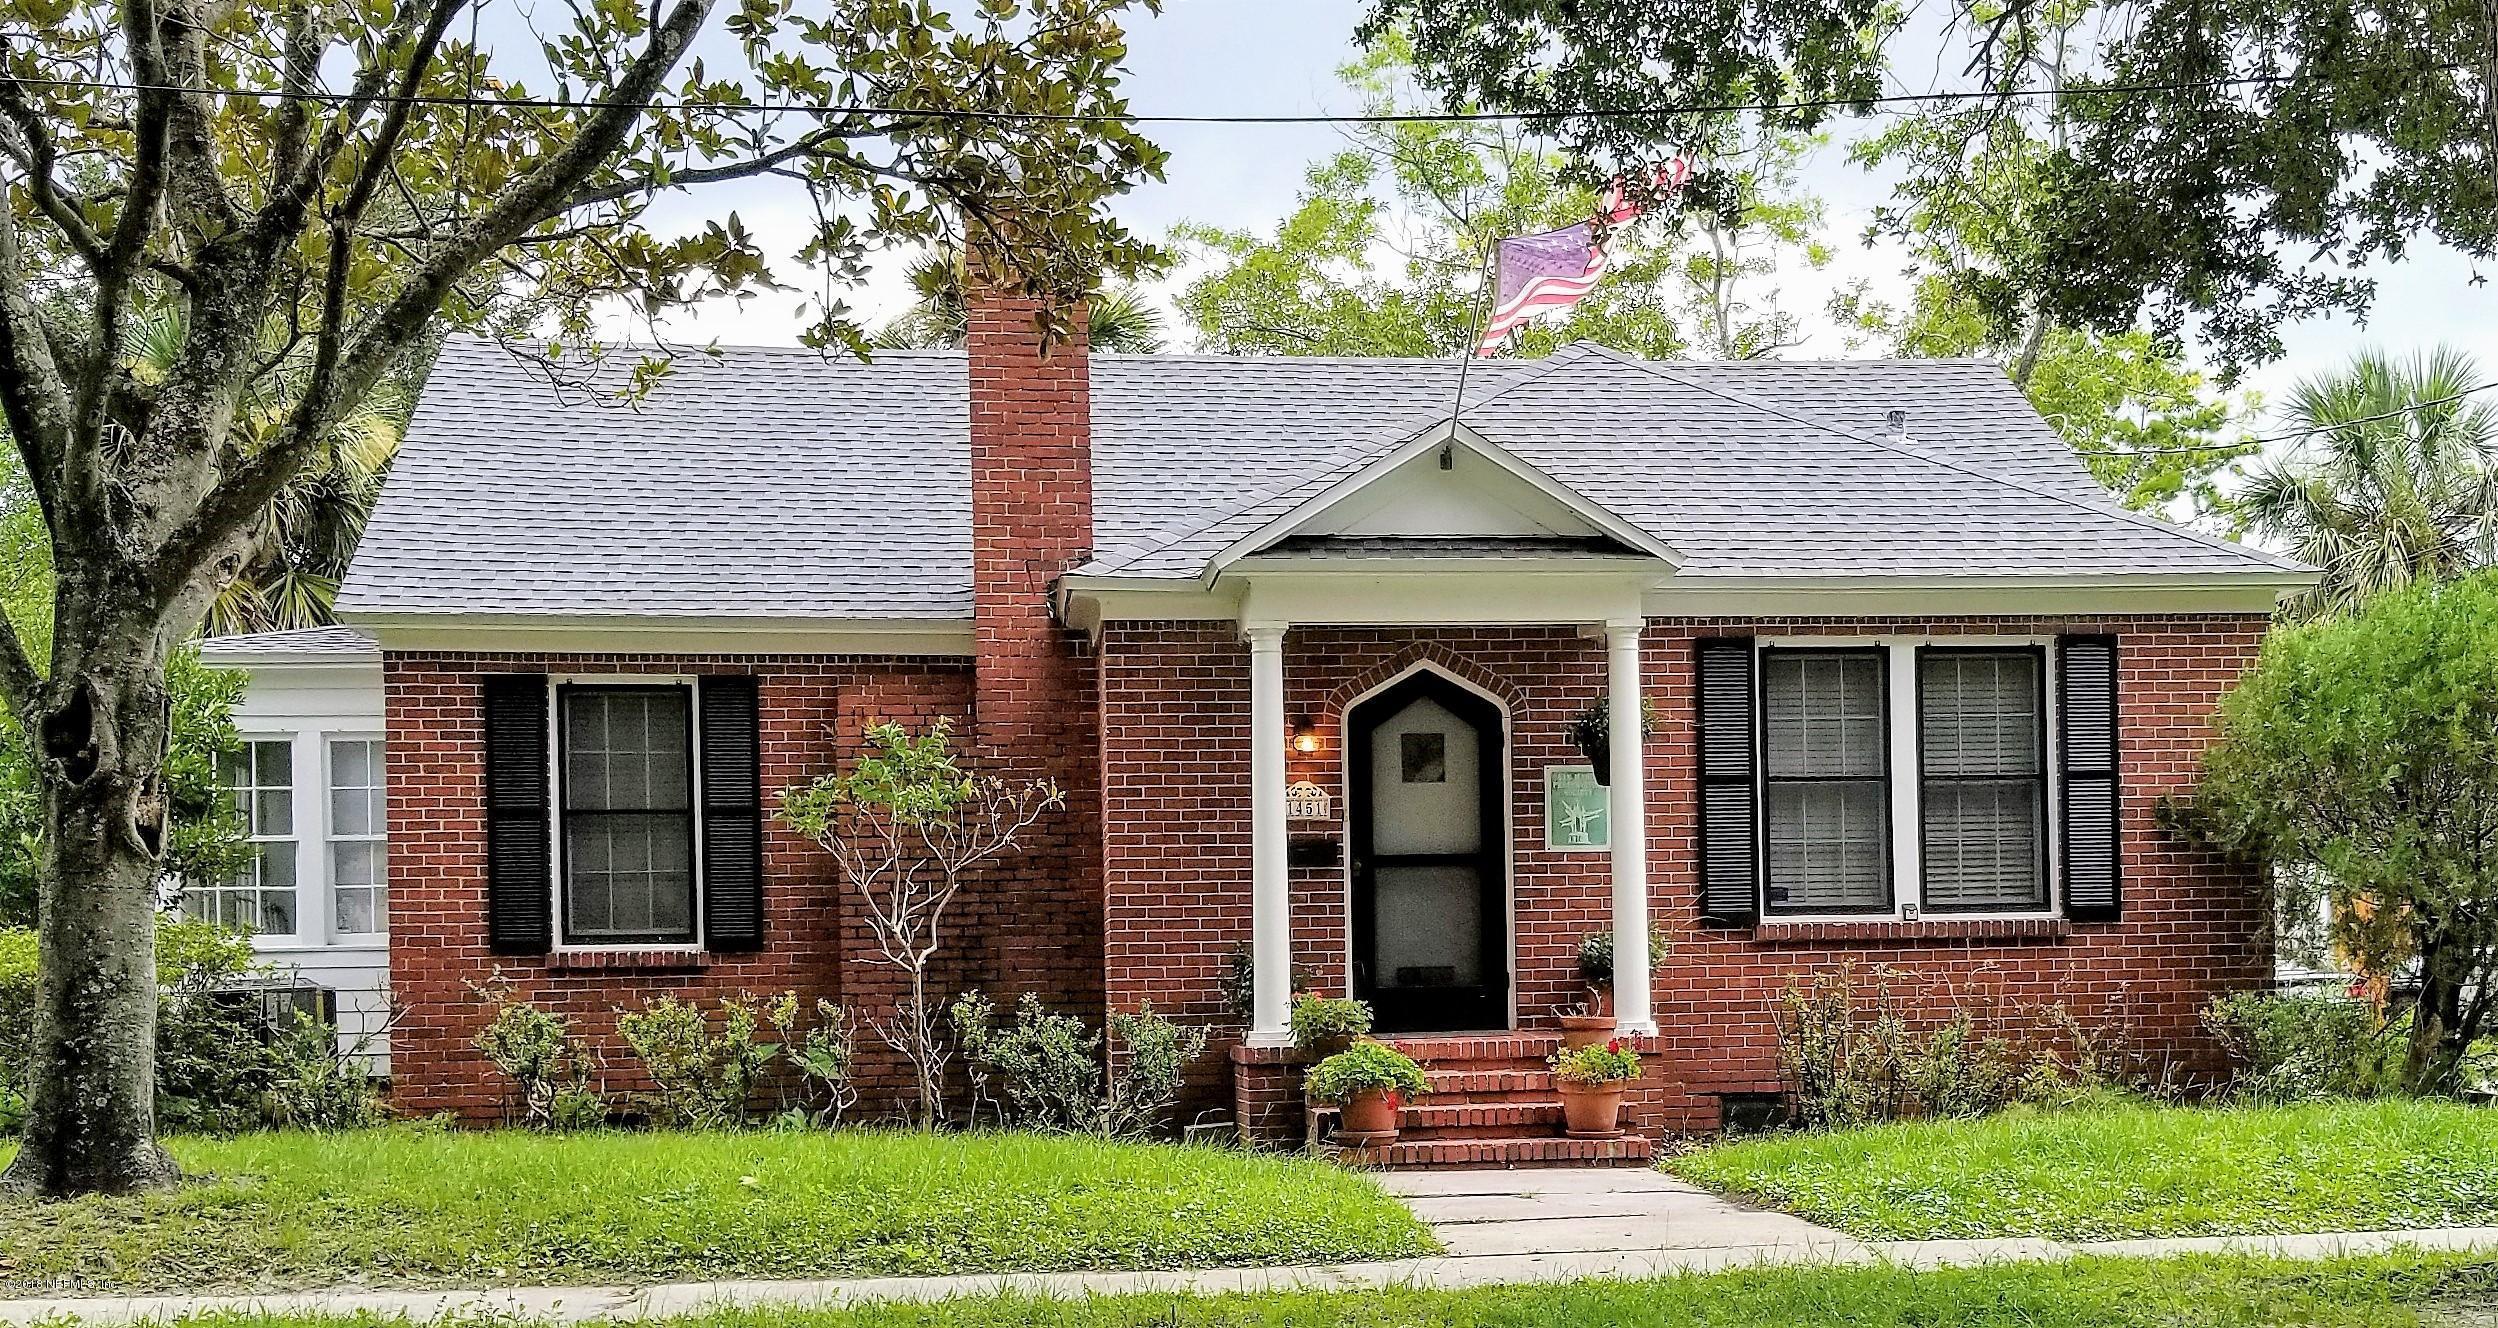 1451 LE BARON, JACKSONVILLE, FLORIDA 32207, ,Commercial,For sale,LE BARON,953494